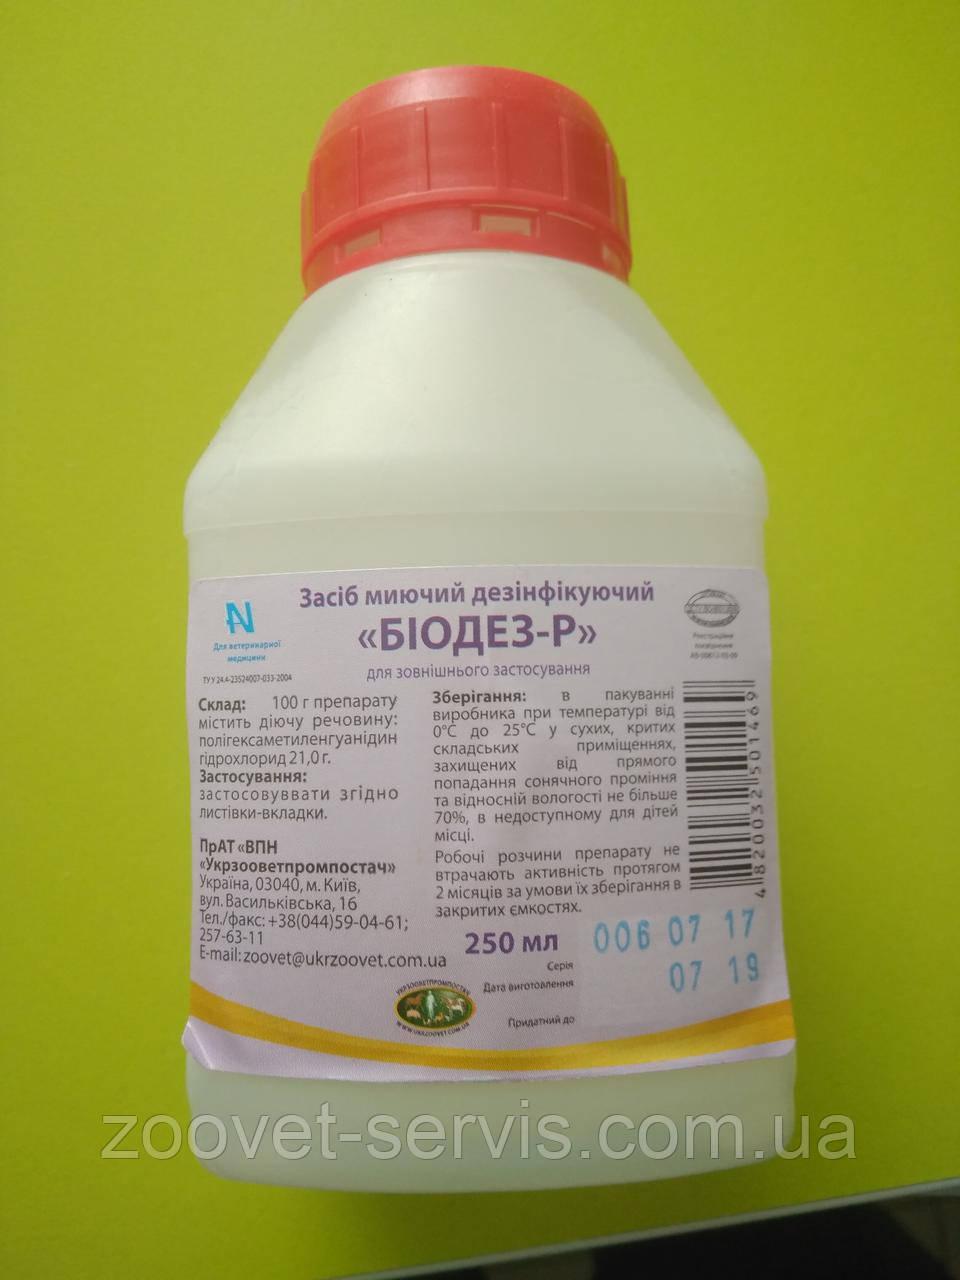 Препарат для дезинфекции Биодез - Р